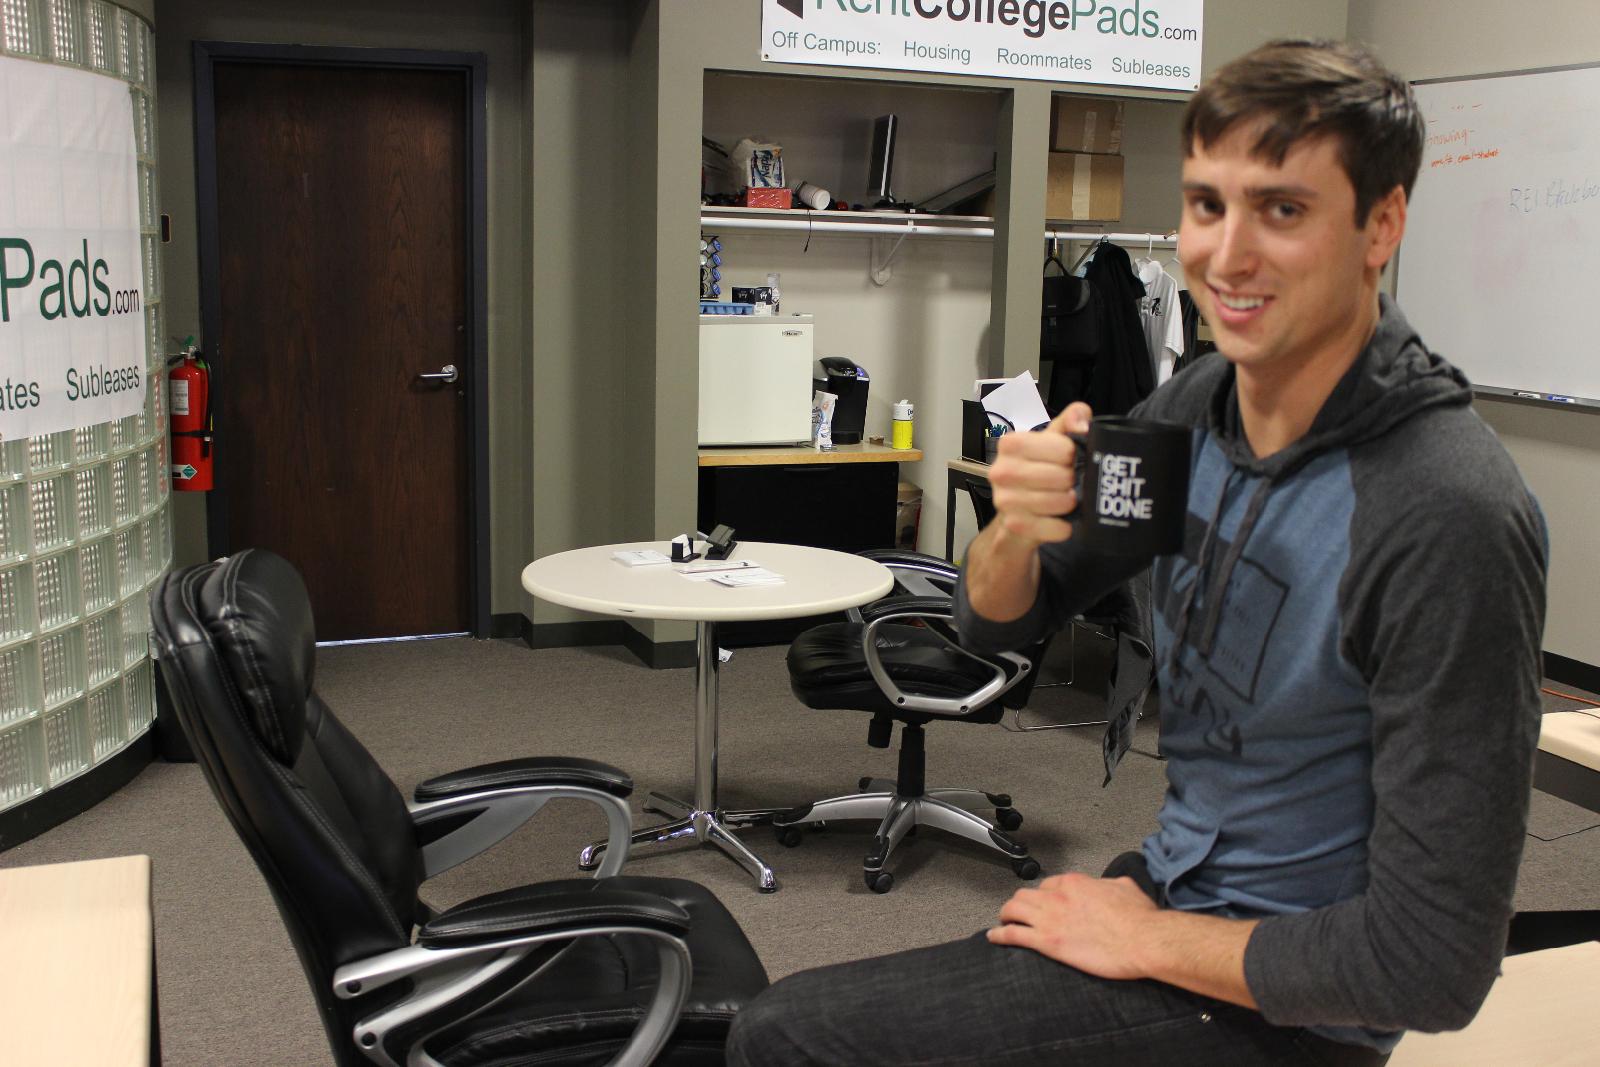 Dominic Anzalone of RentCollegePads